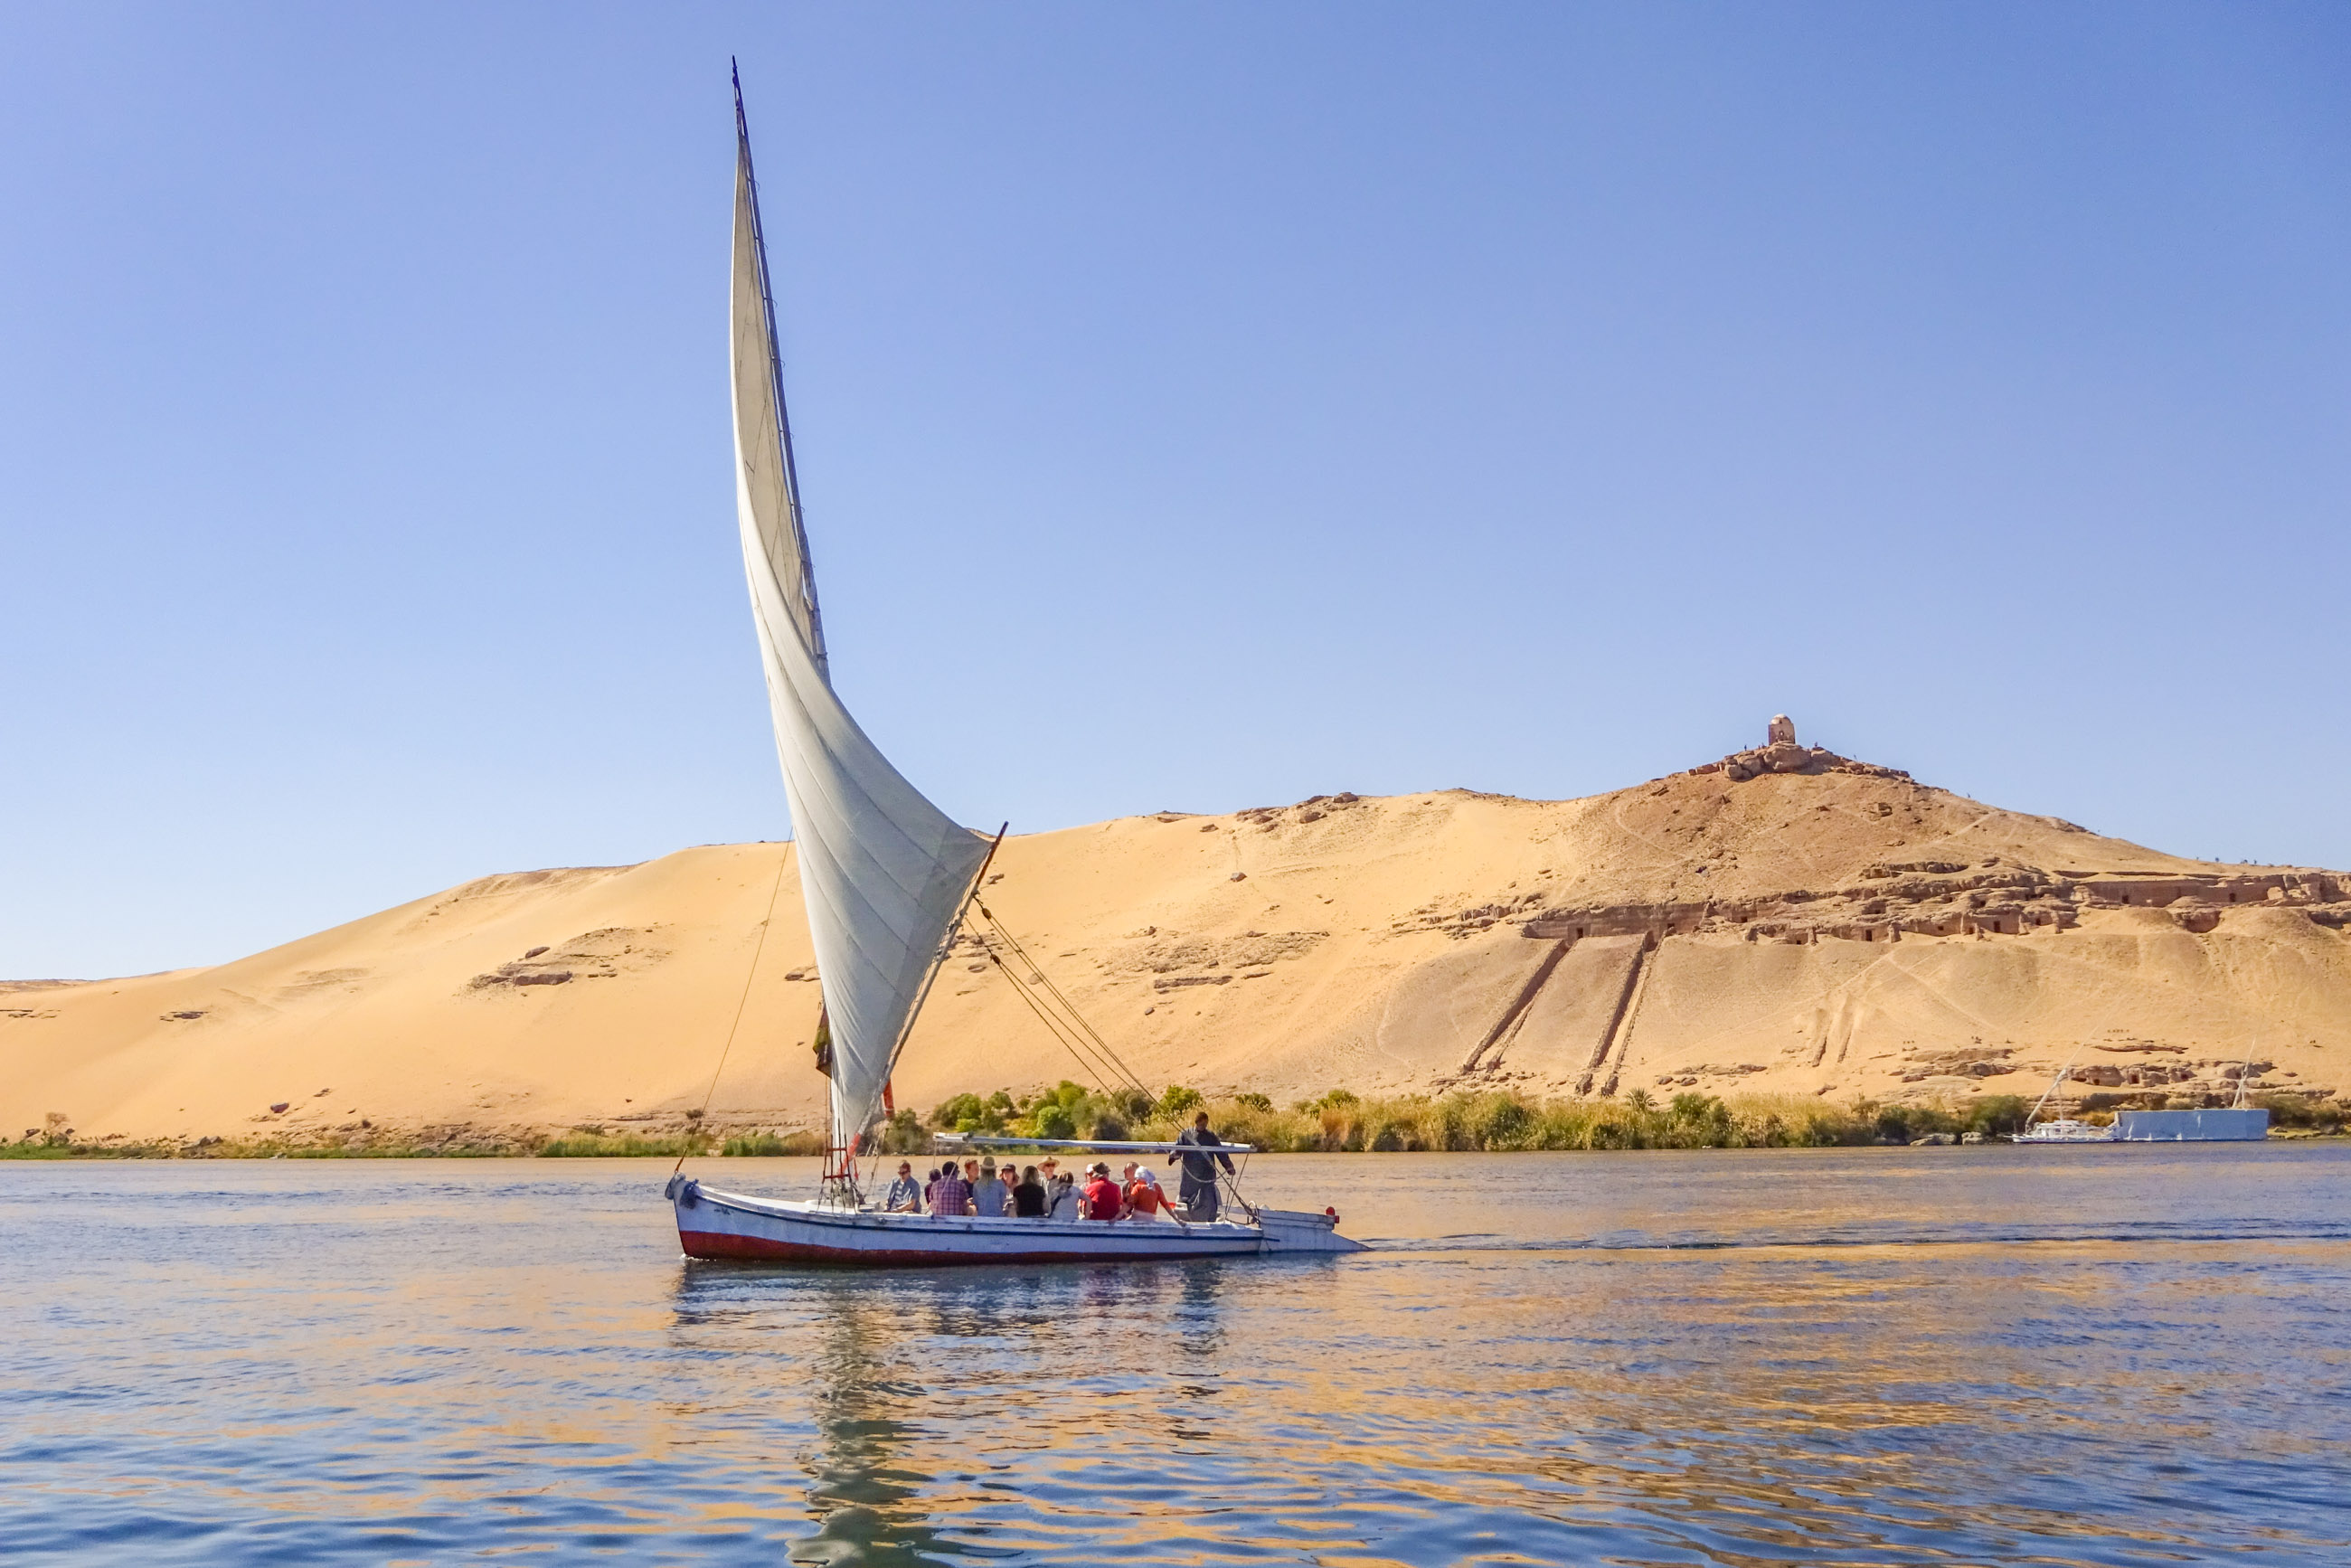 https://bubo.sk/uploads/galleries/18745/miroslavadlha_egypt_aswan-18-.jpg